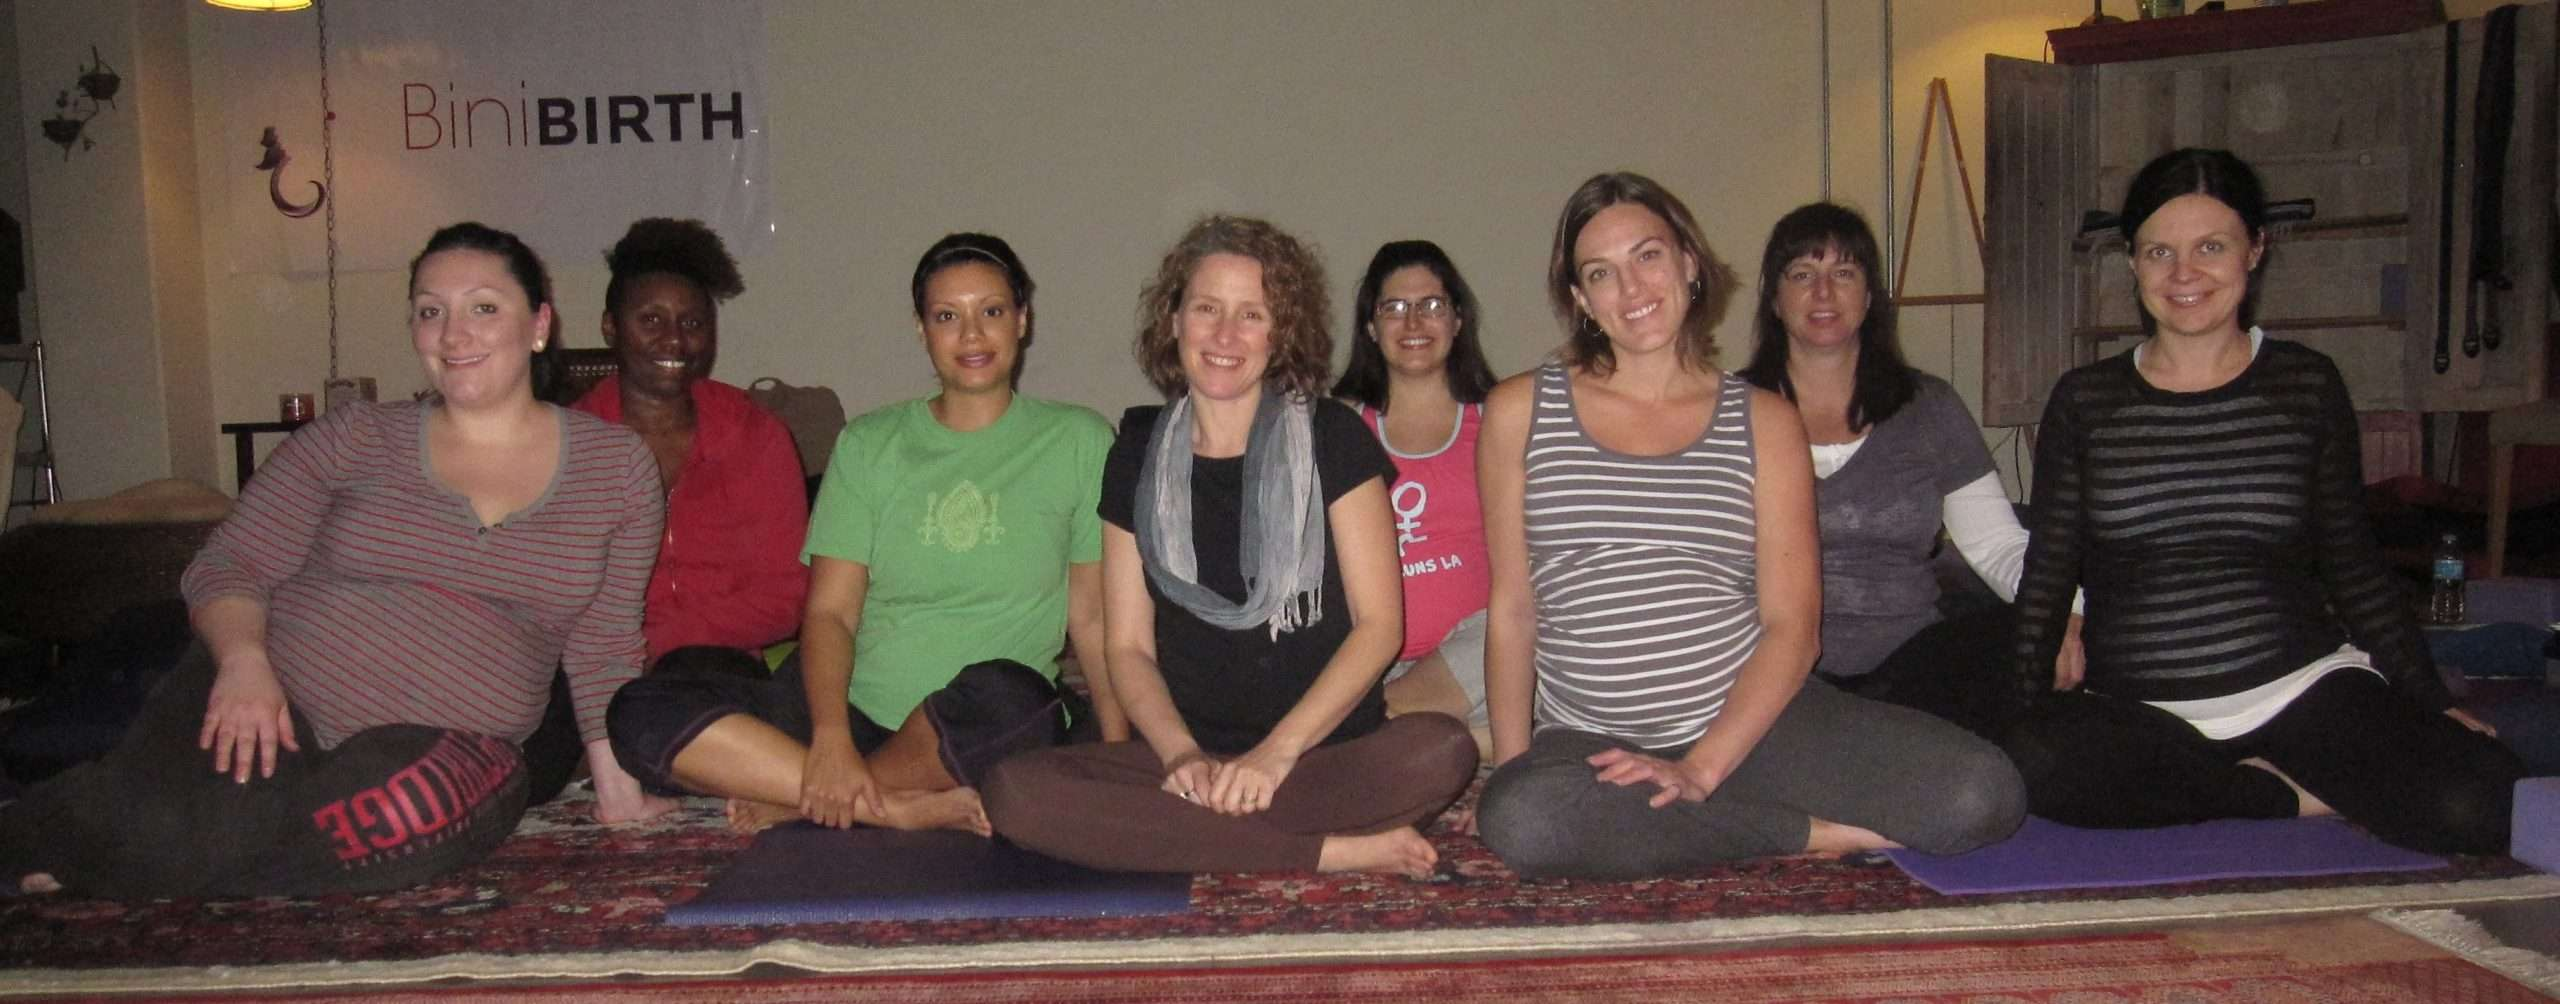 Prenatal-Yoga-Bini-Birth-c